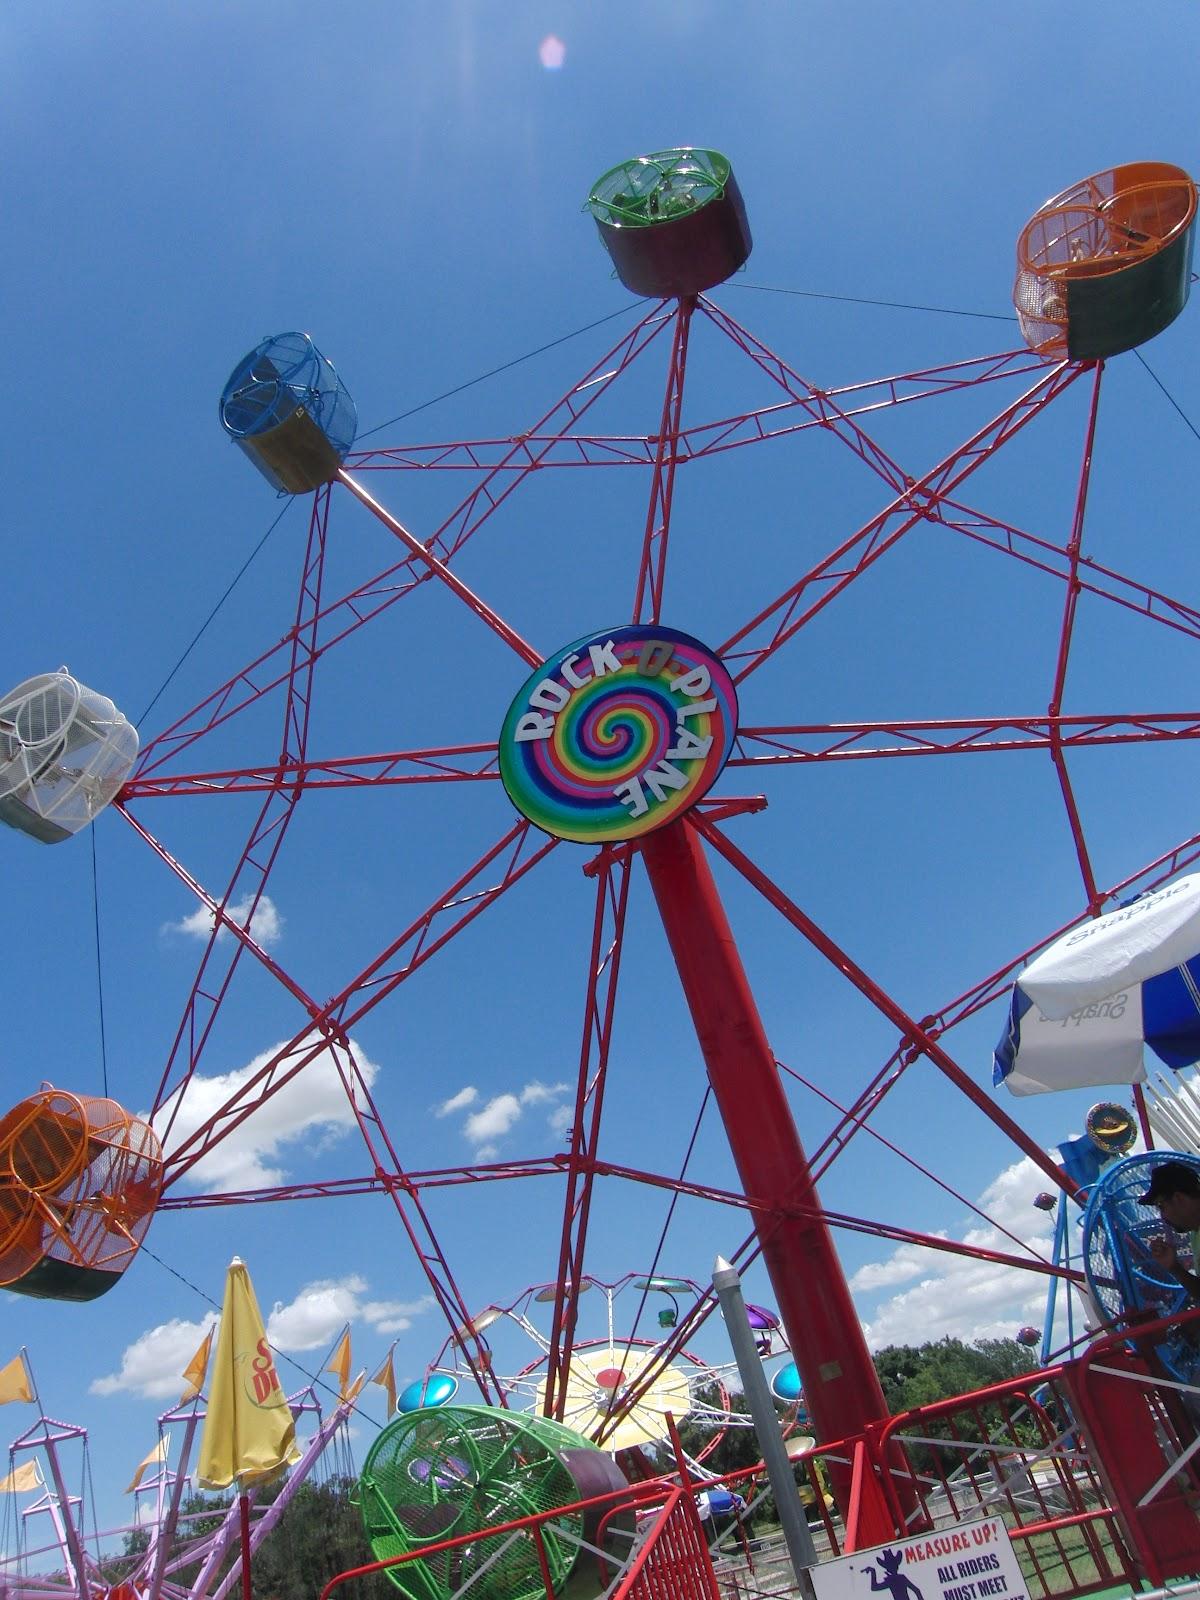 Sandy Lake Amusement Park Carrollton